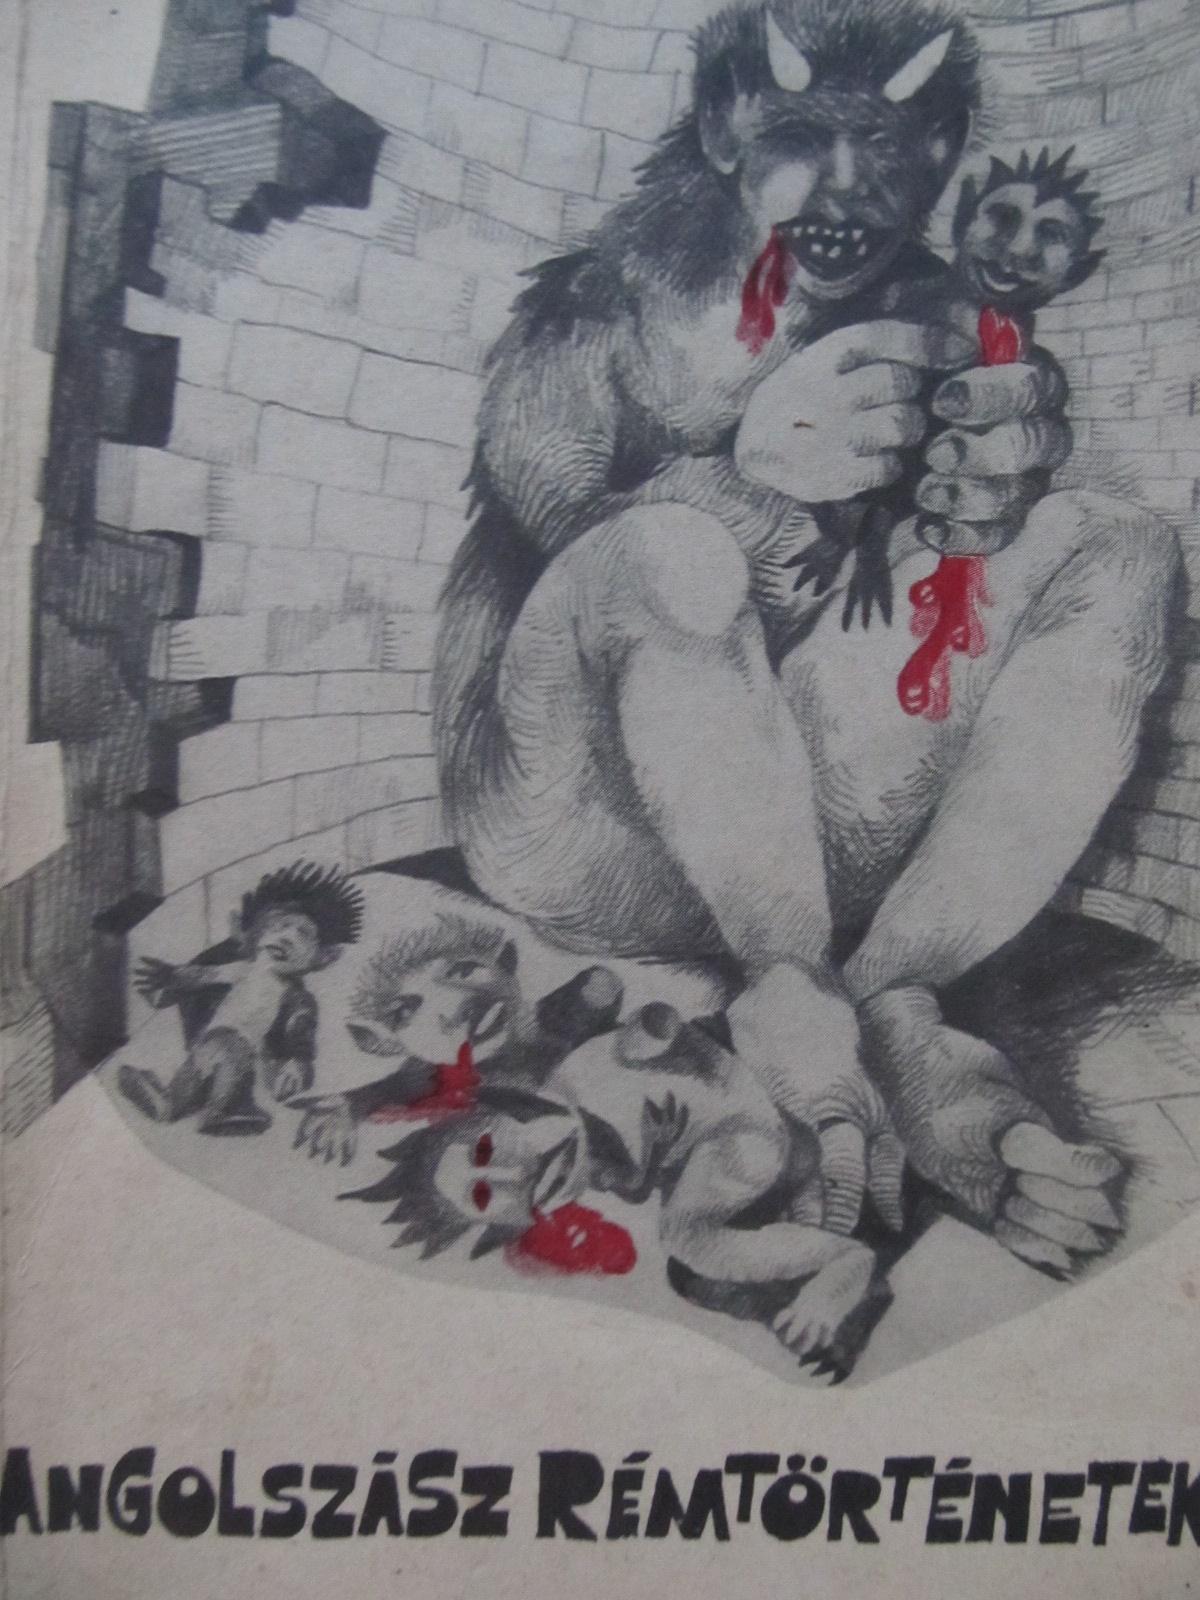 Angolszasz remtortenetek - Bram Stoker , M. R. James | Detalii carte